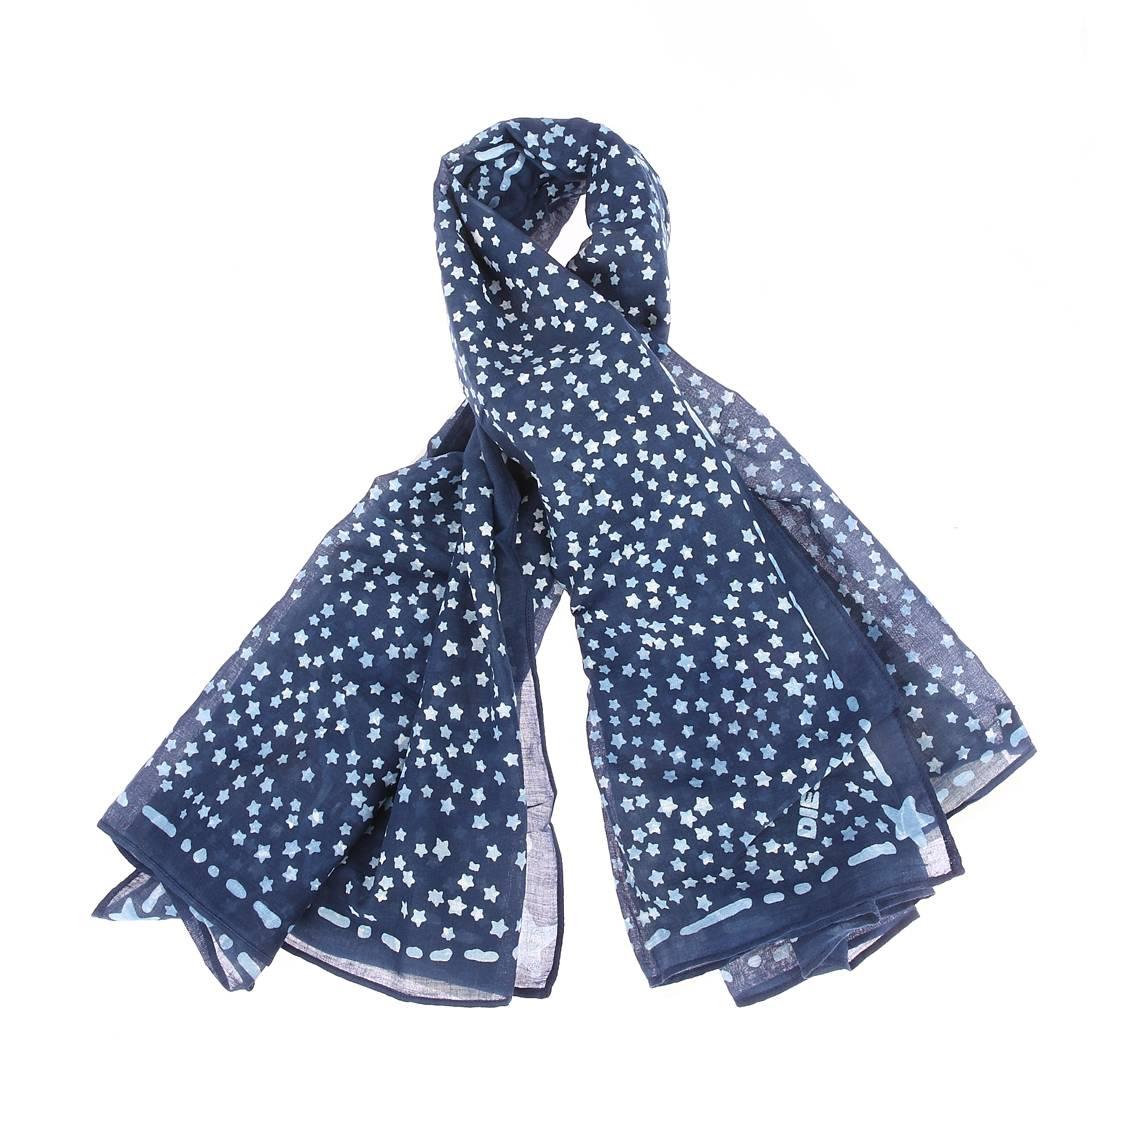 Chèche  scheese bleu marine à imprimés étoiles